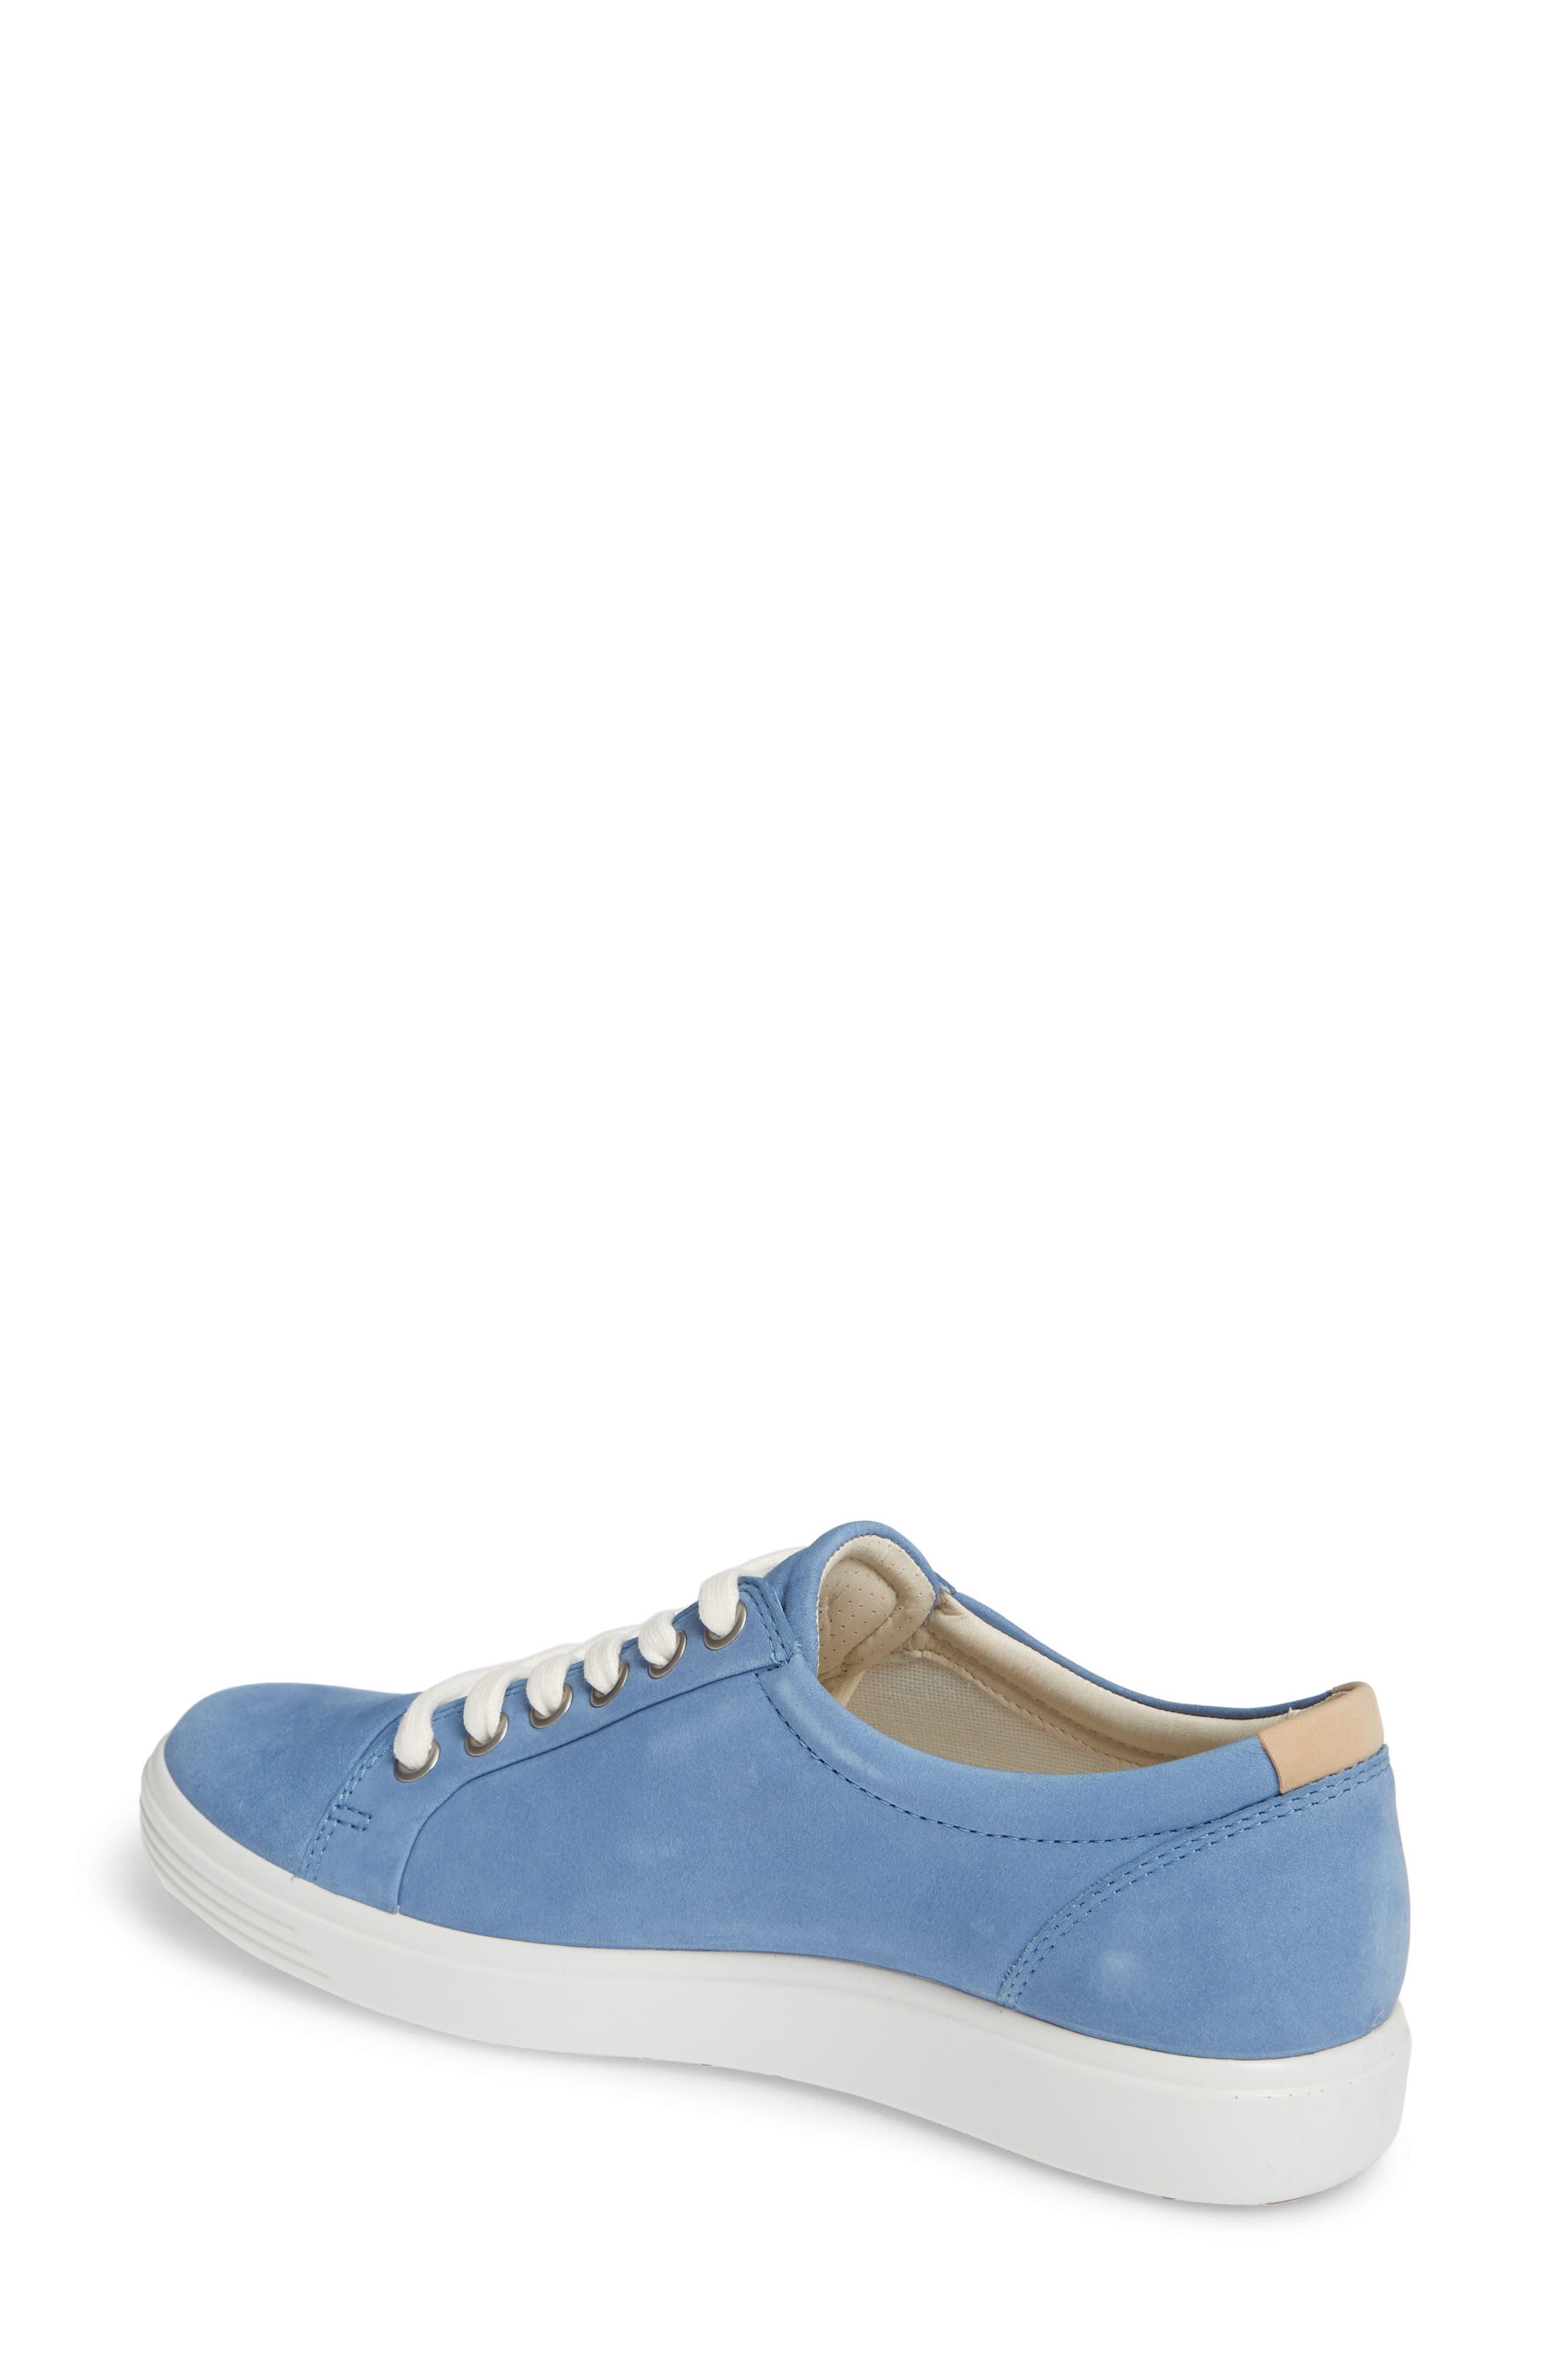 Soft 7 Sneaker,                             Alternate thumbnail 2, color,                             RETRO BLUE LEATHER